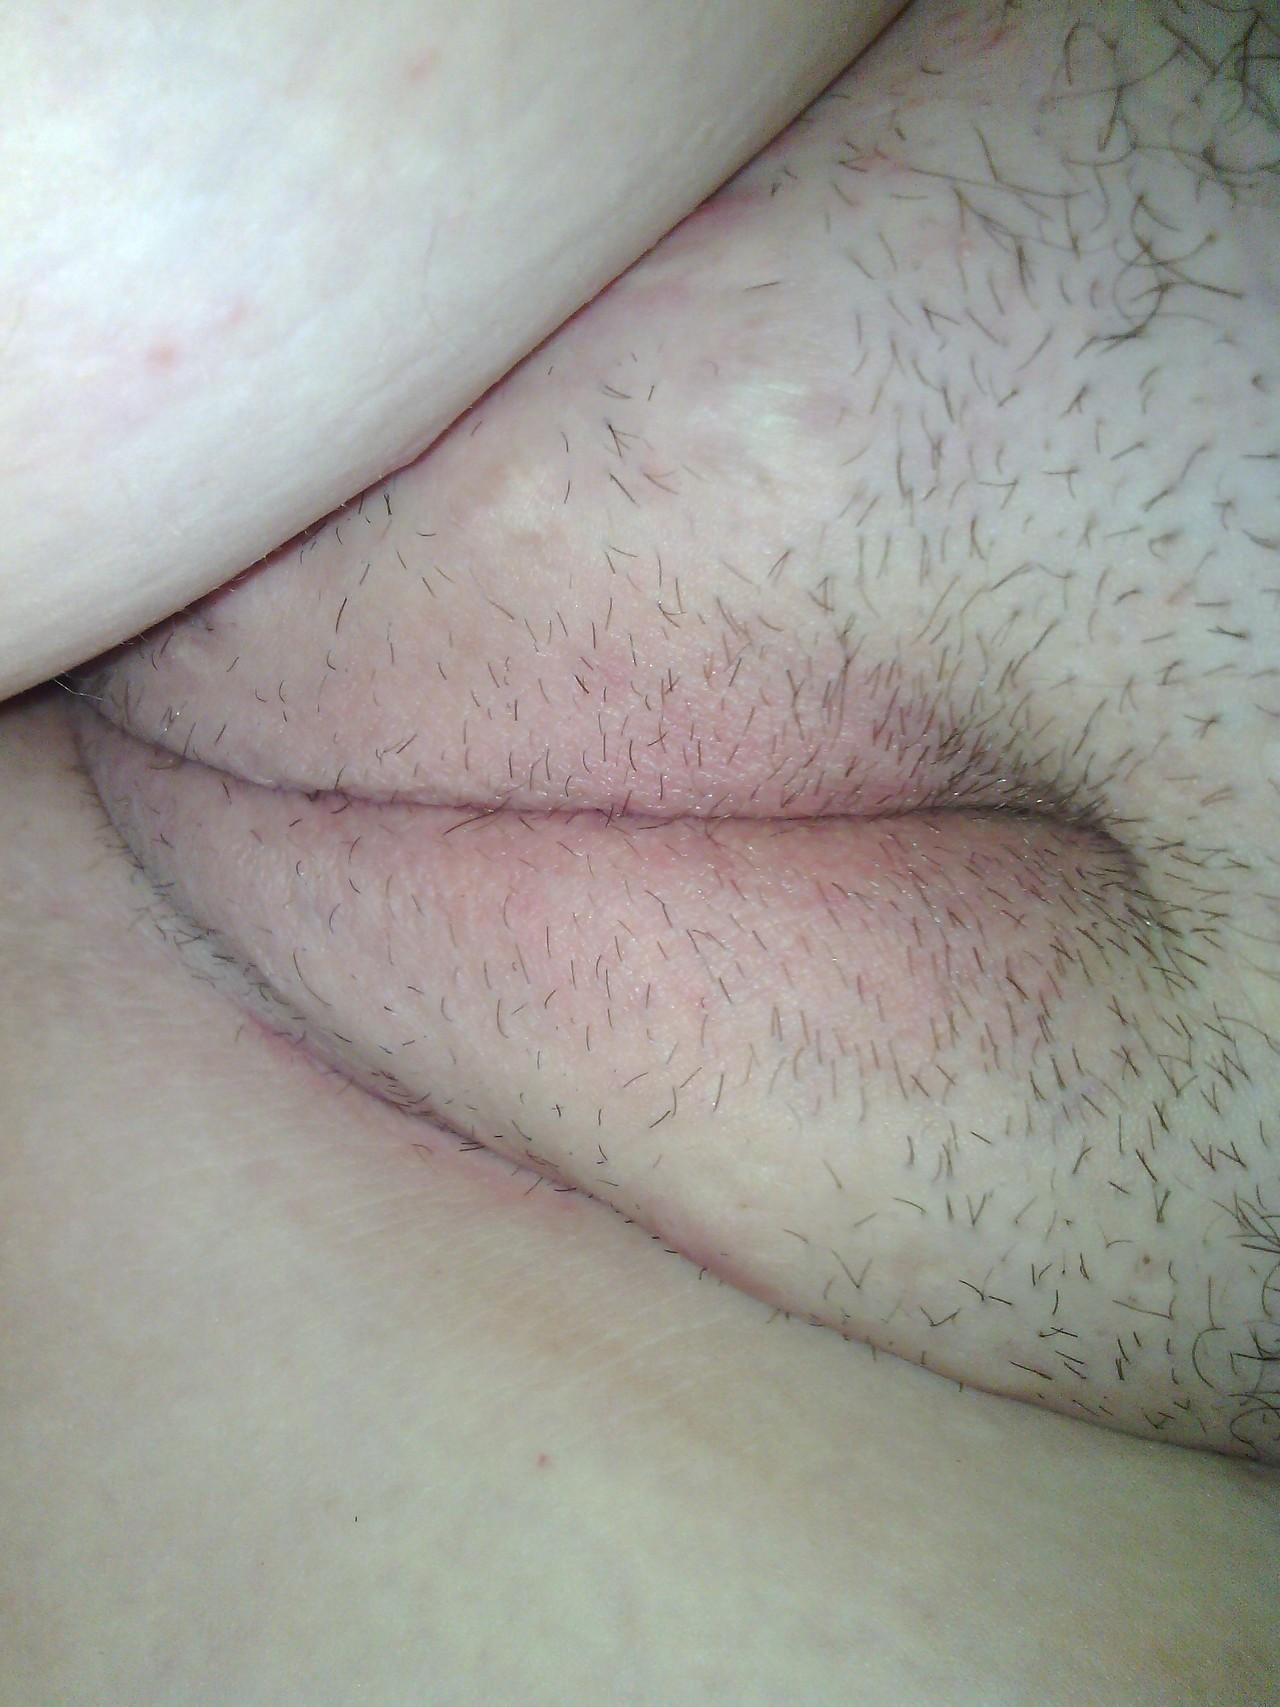 il lui rase la chatte grosse salope anal